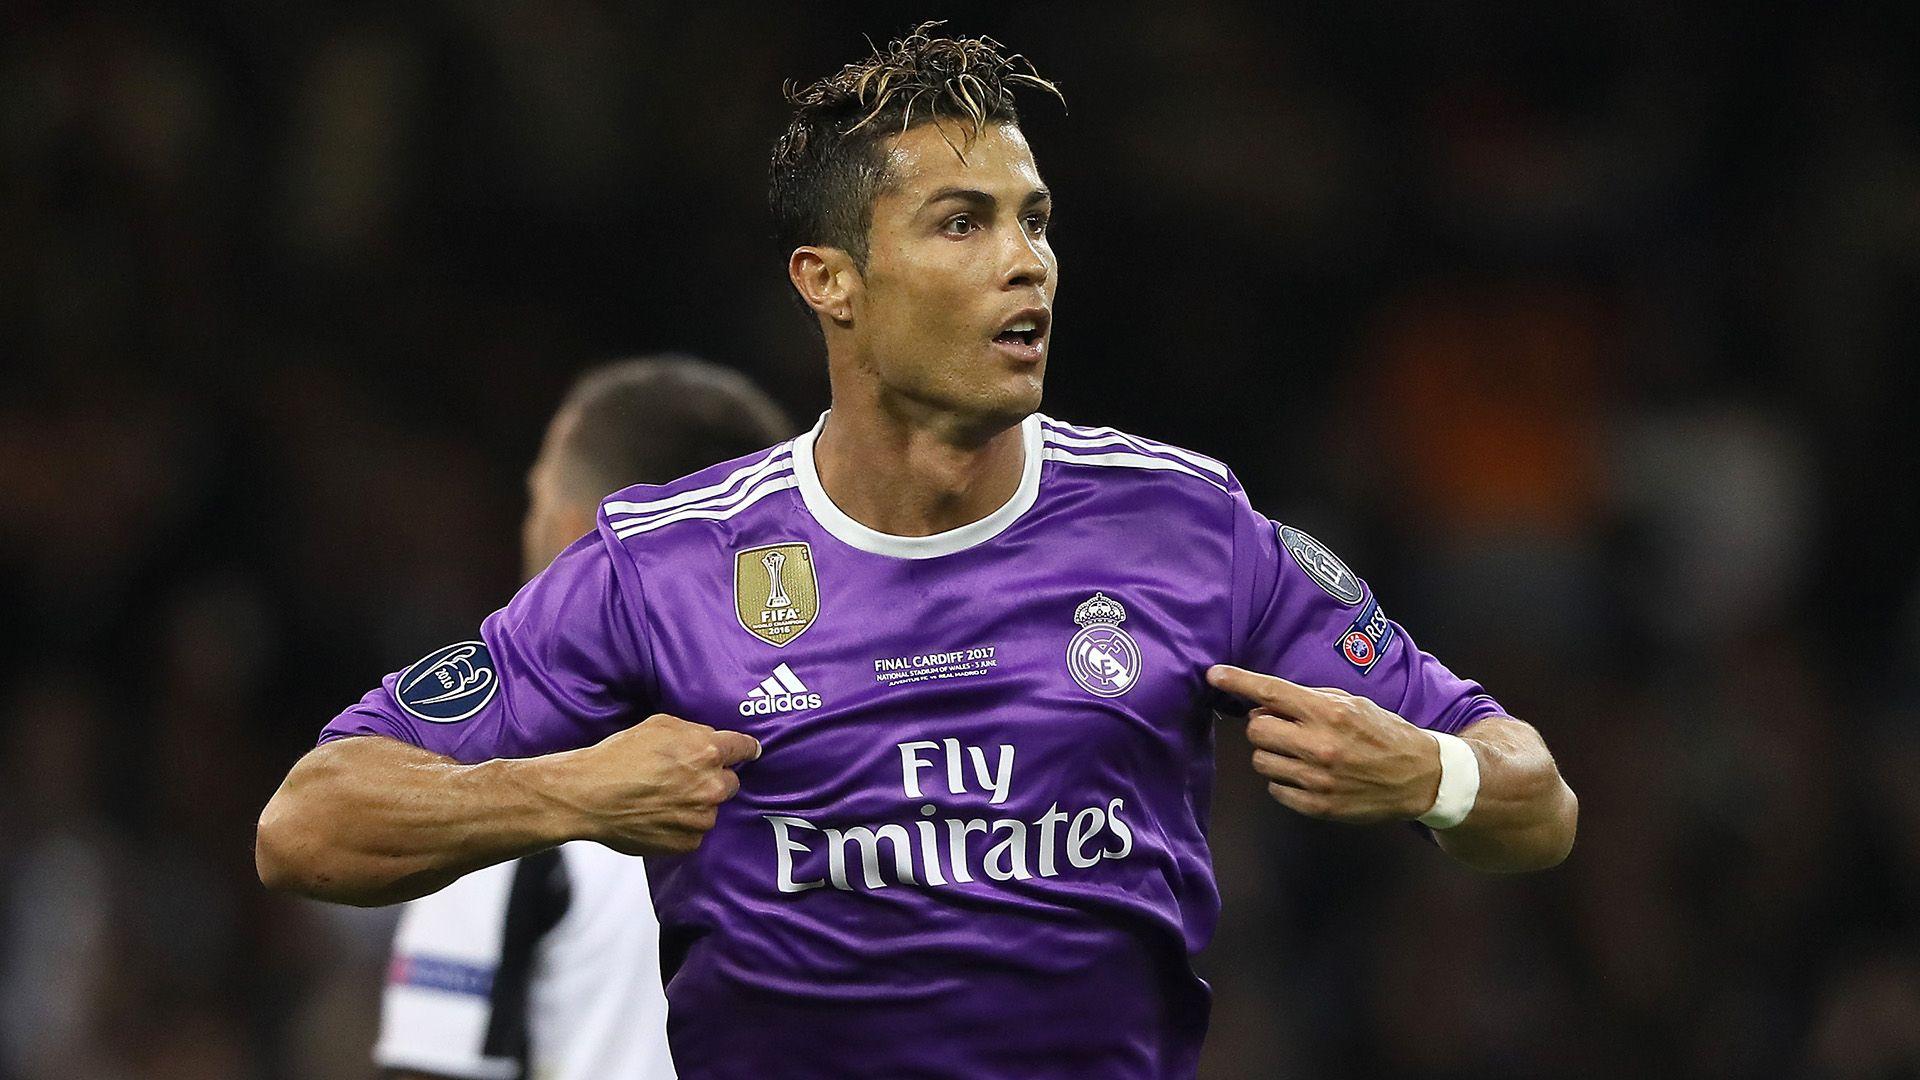 Ronaldo 'wants England return' – reports